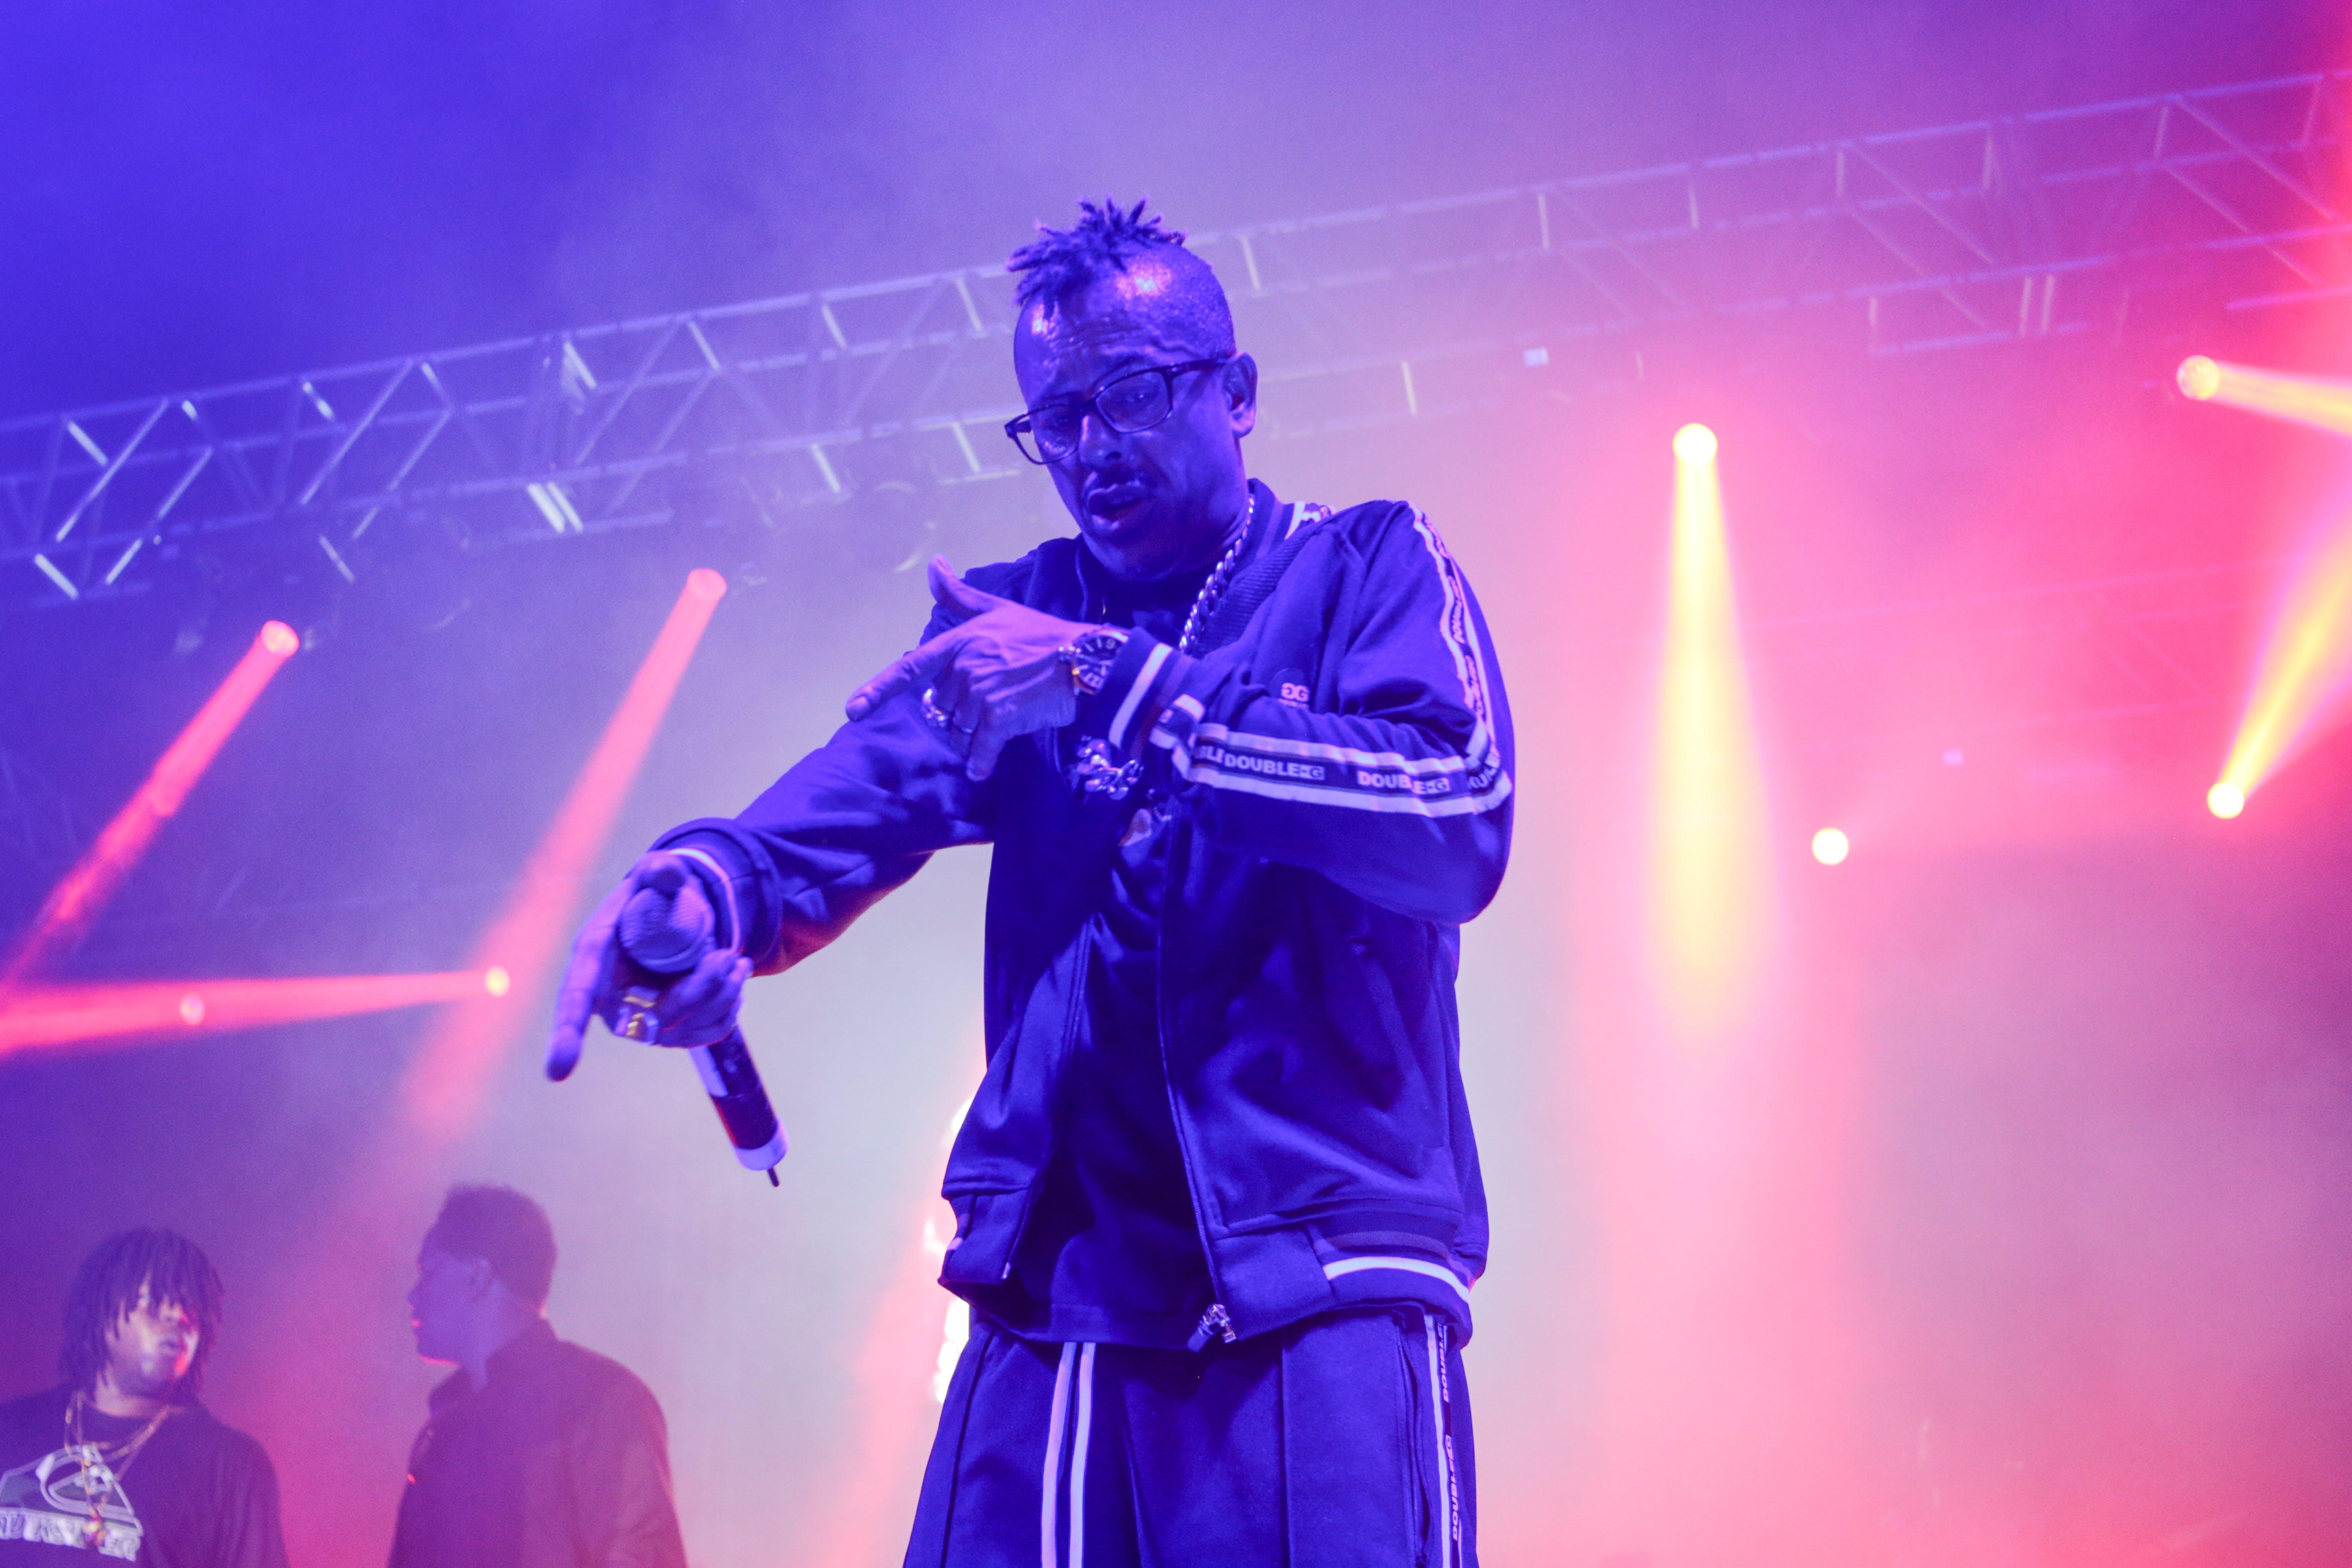 Man Wearing Zip Jacket Having Concert on Stage